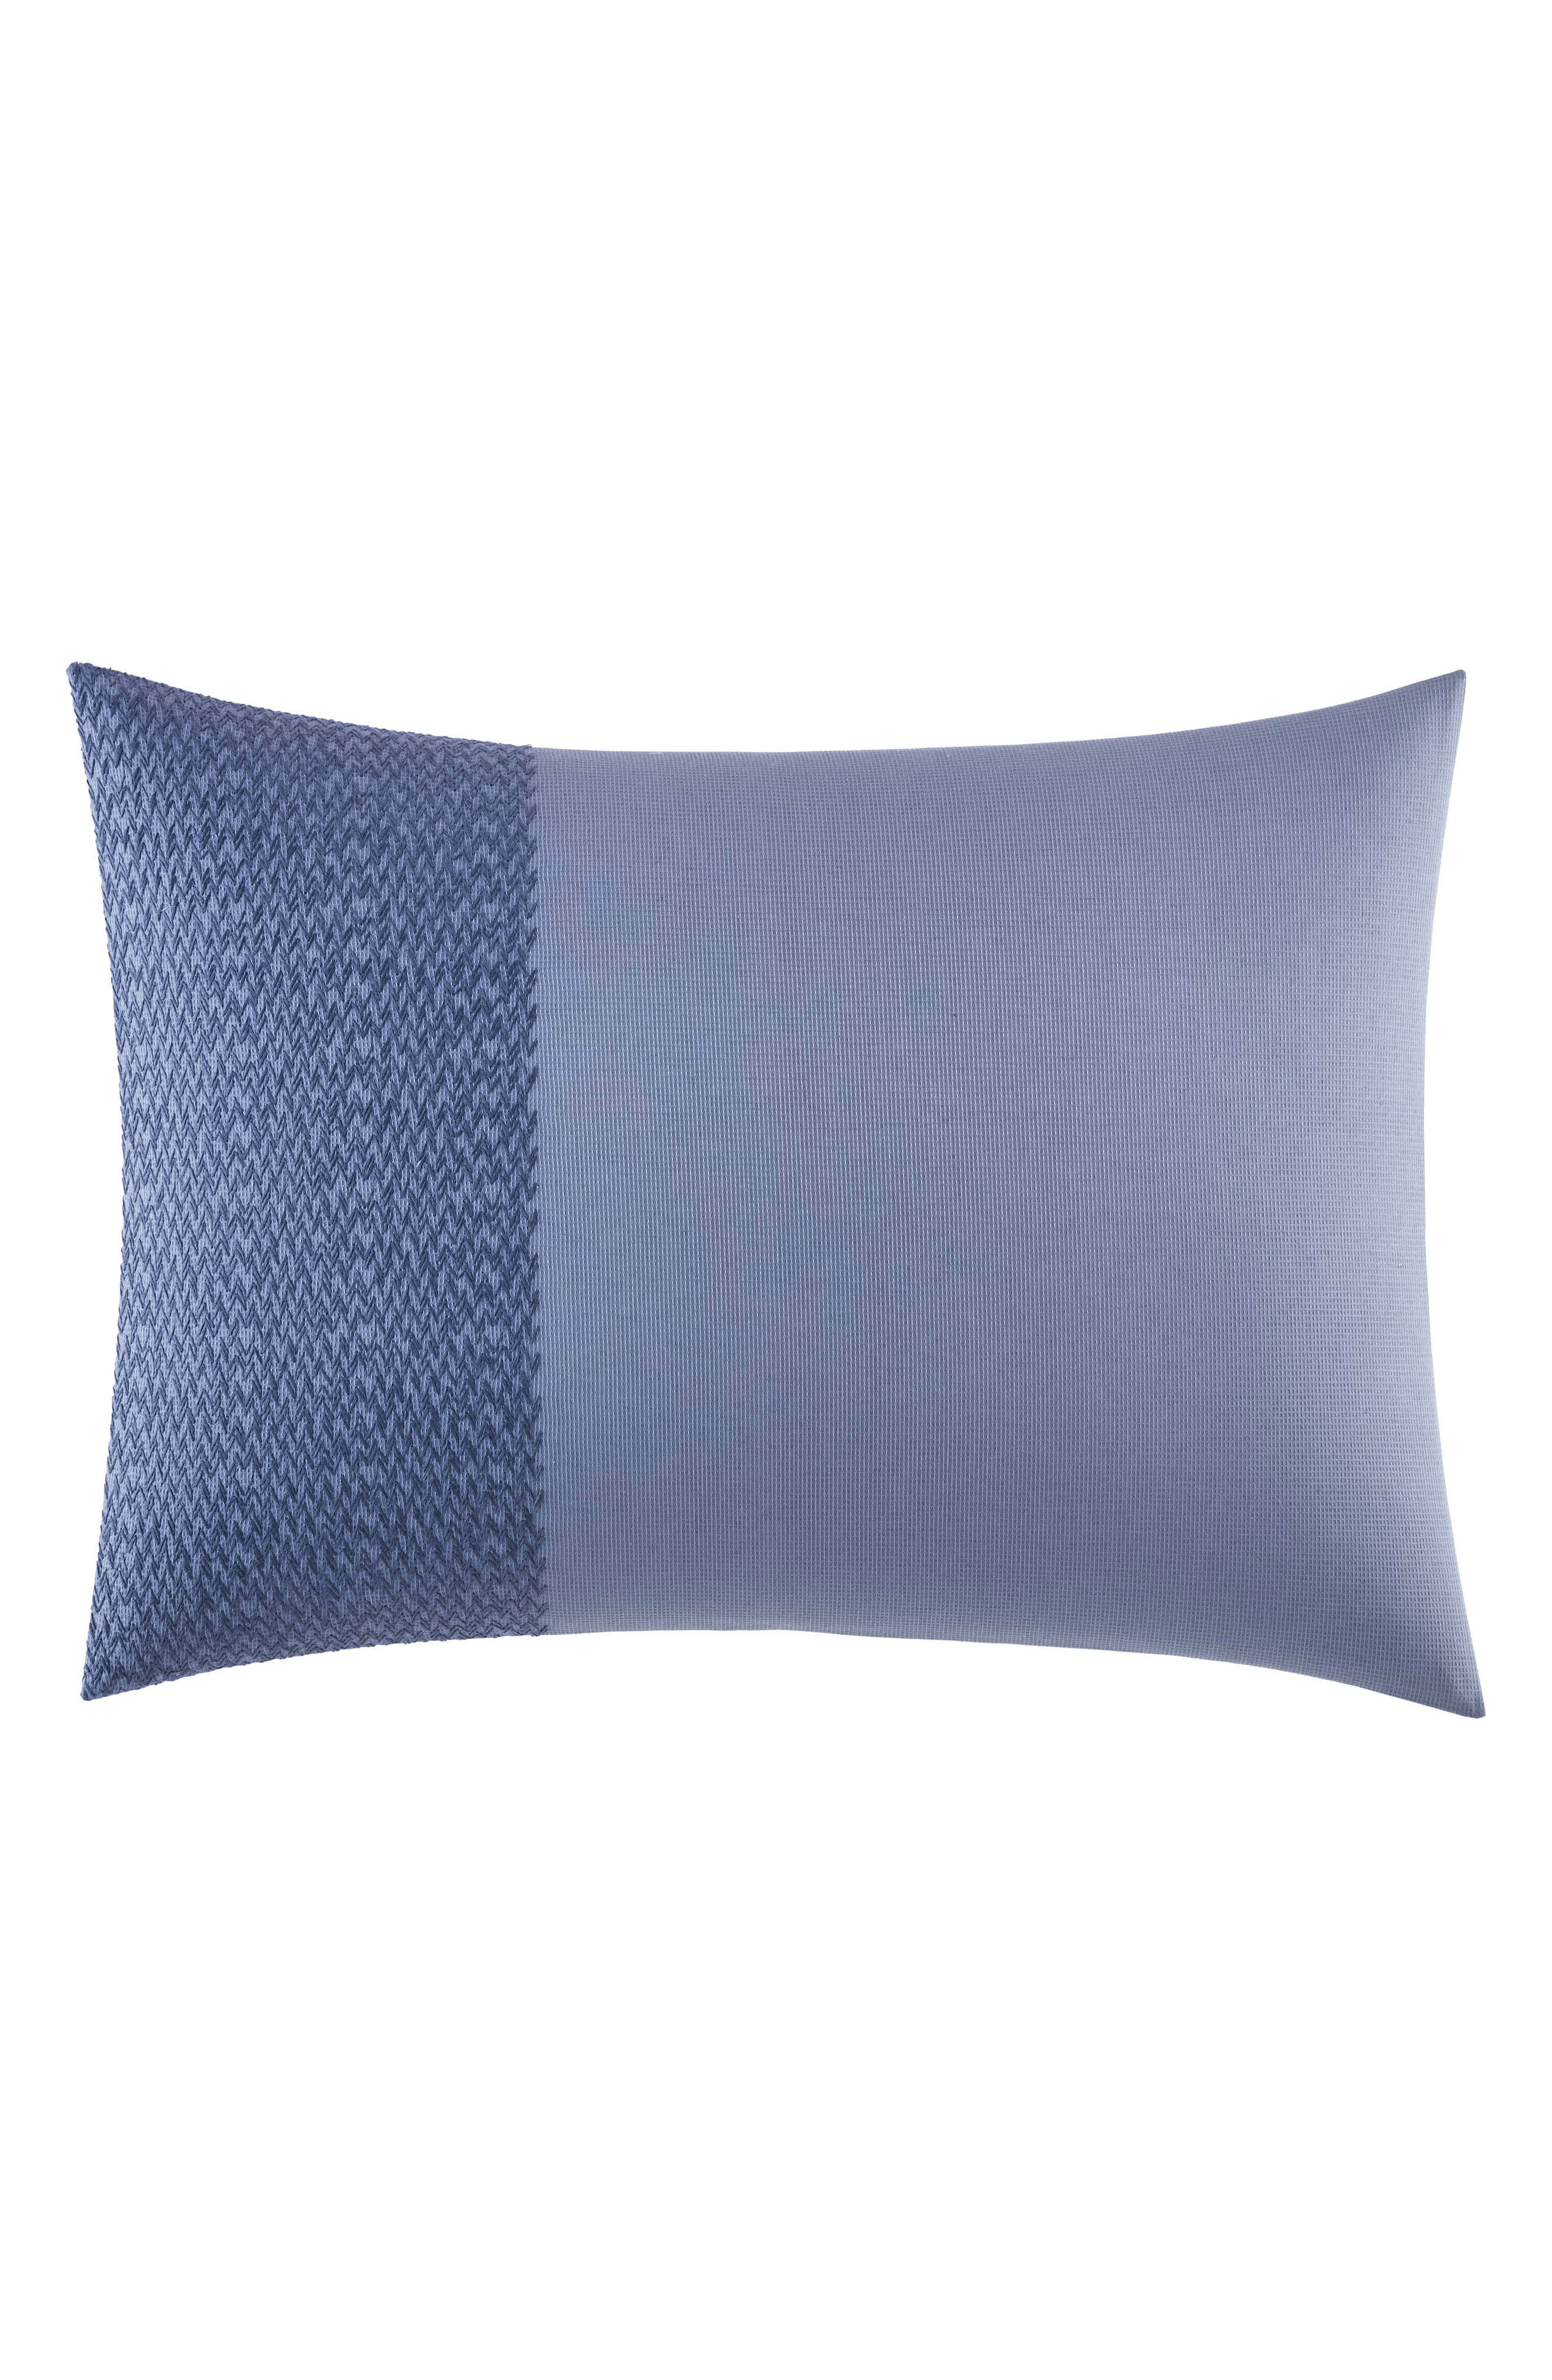 Chevron Breakfast Pillow,                             Main thumbnail 1, color,